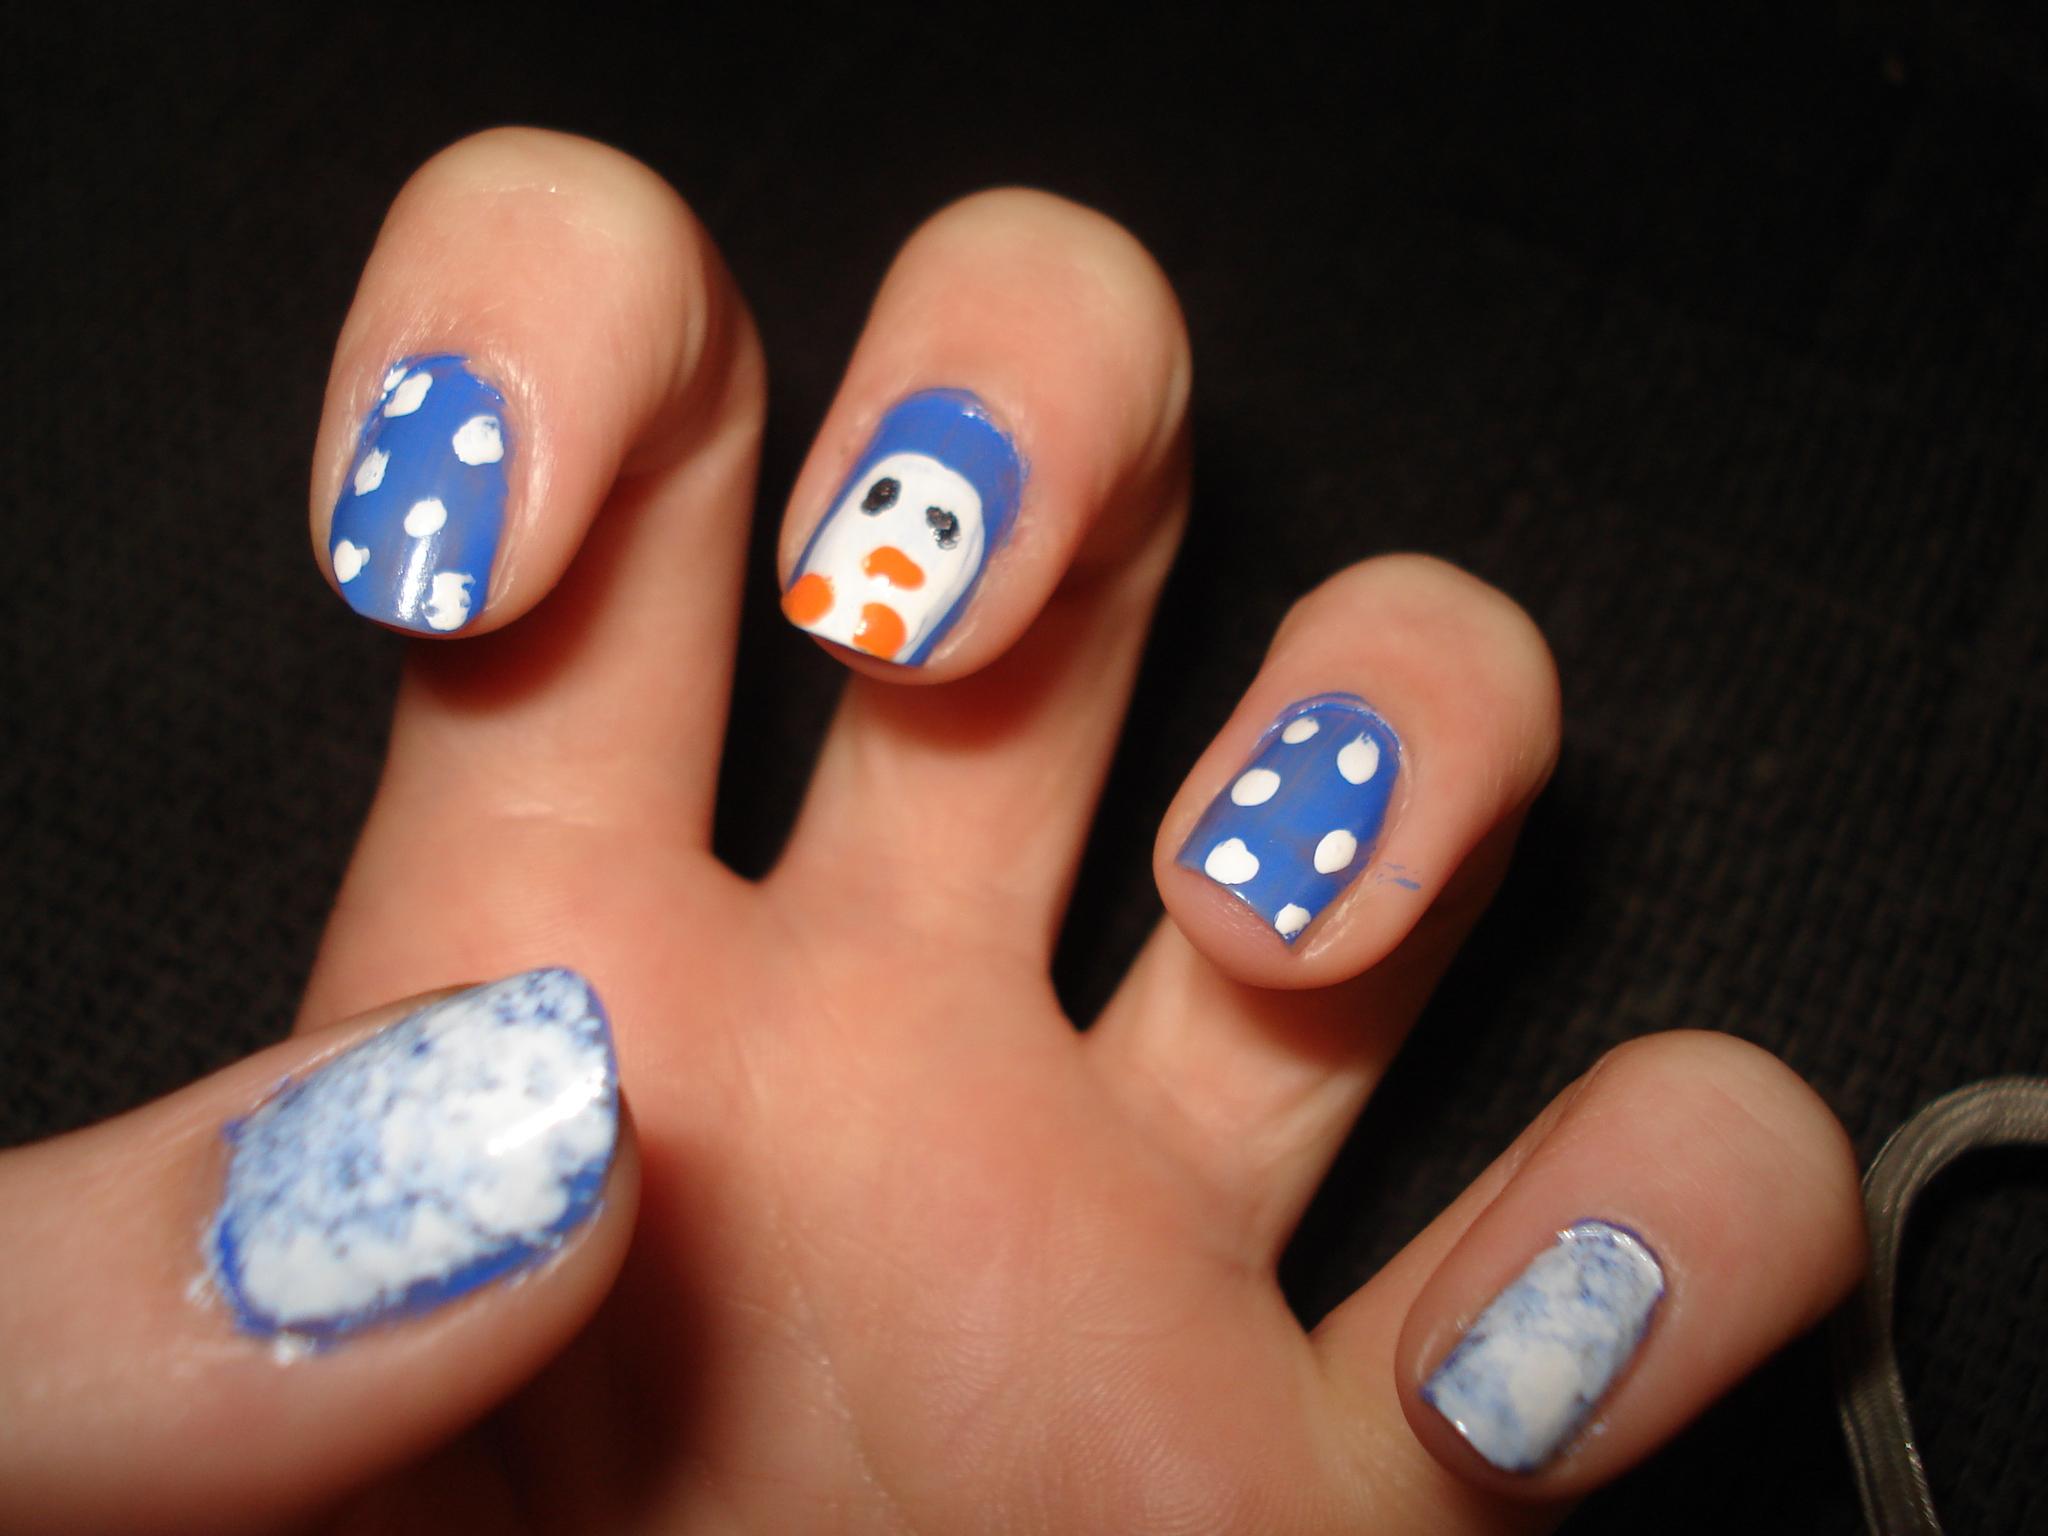 Nails - Penguin Nail Art Photo (31178764) - Fanpop